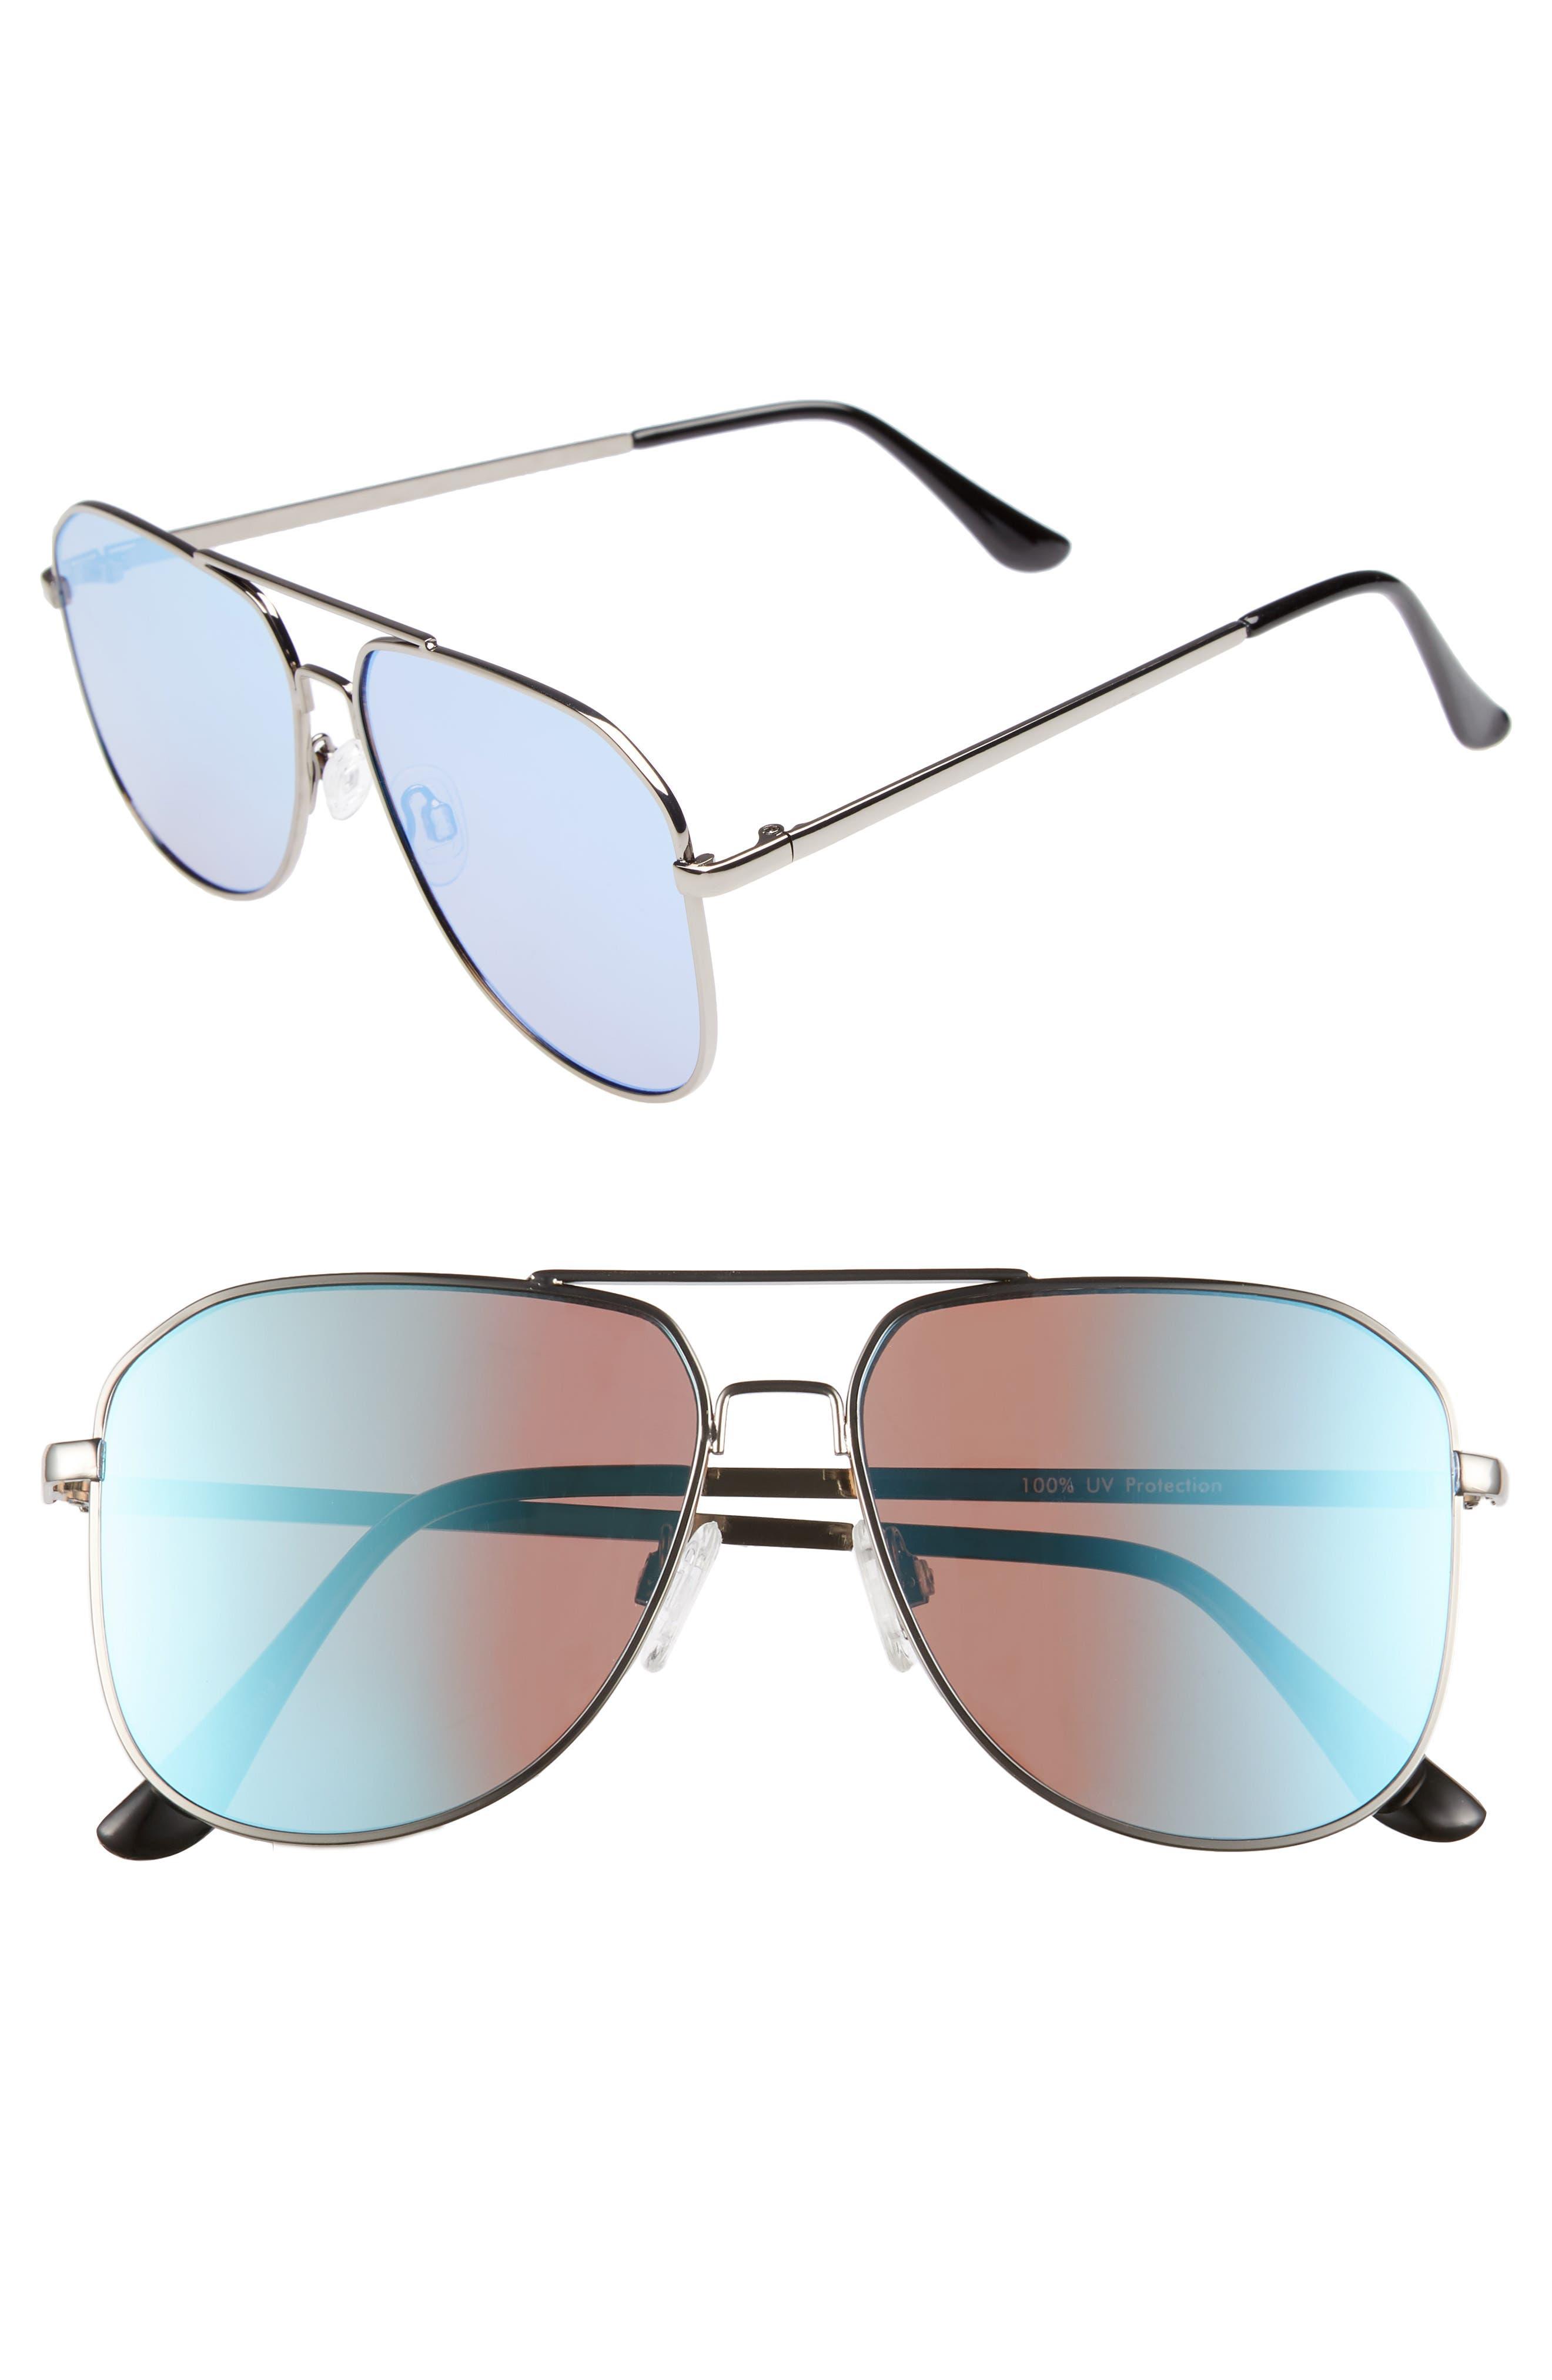 54mm Aviator Sunglasses,                         Main,                         color, 040